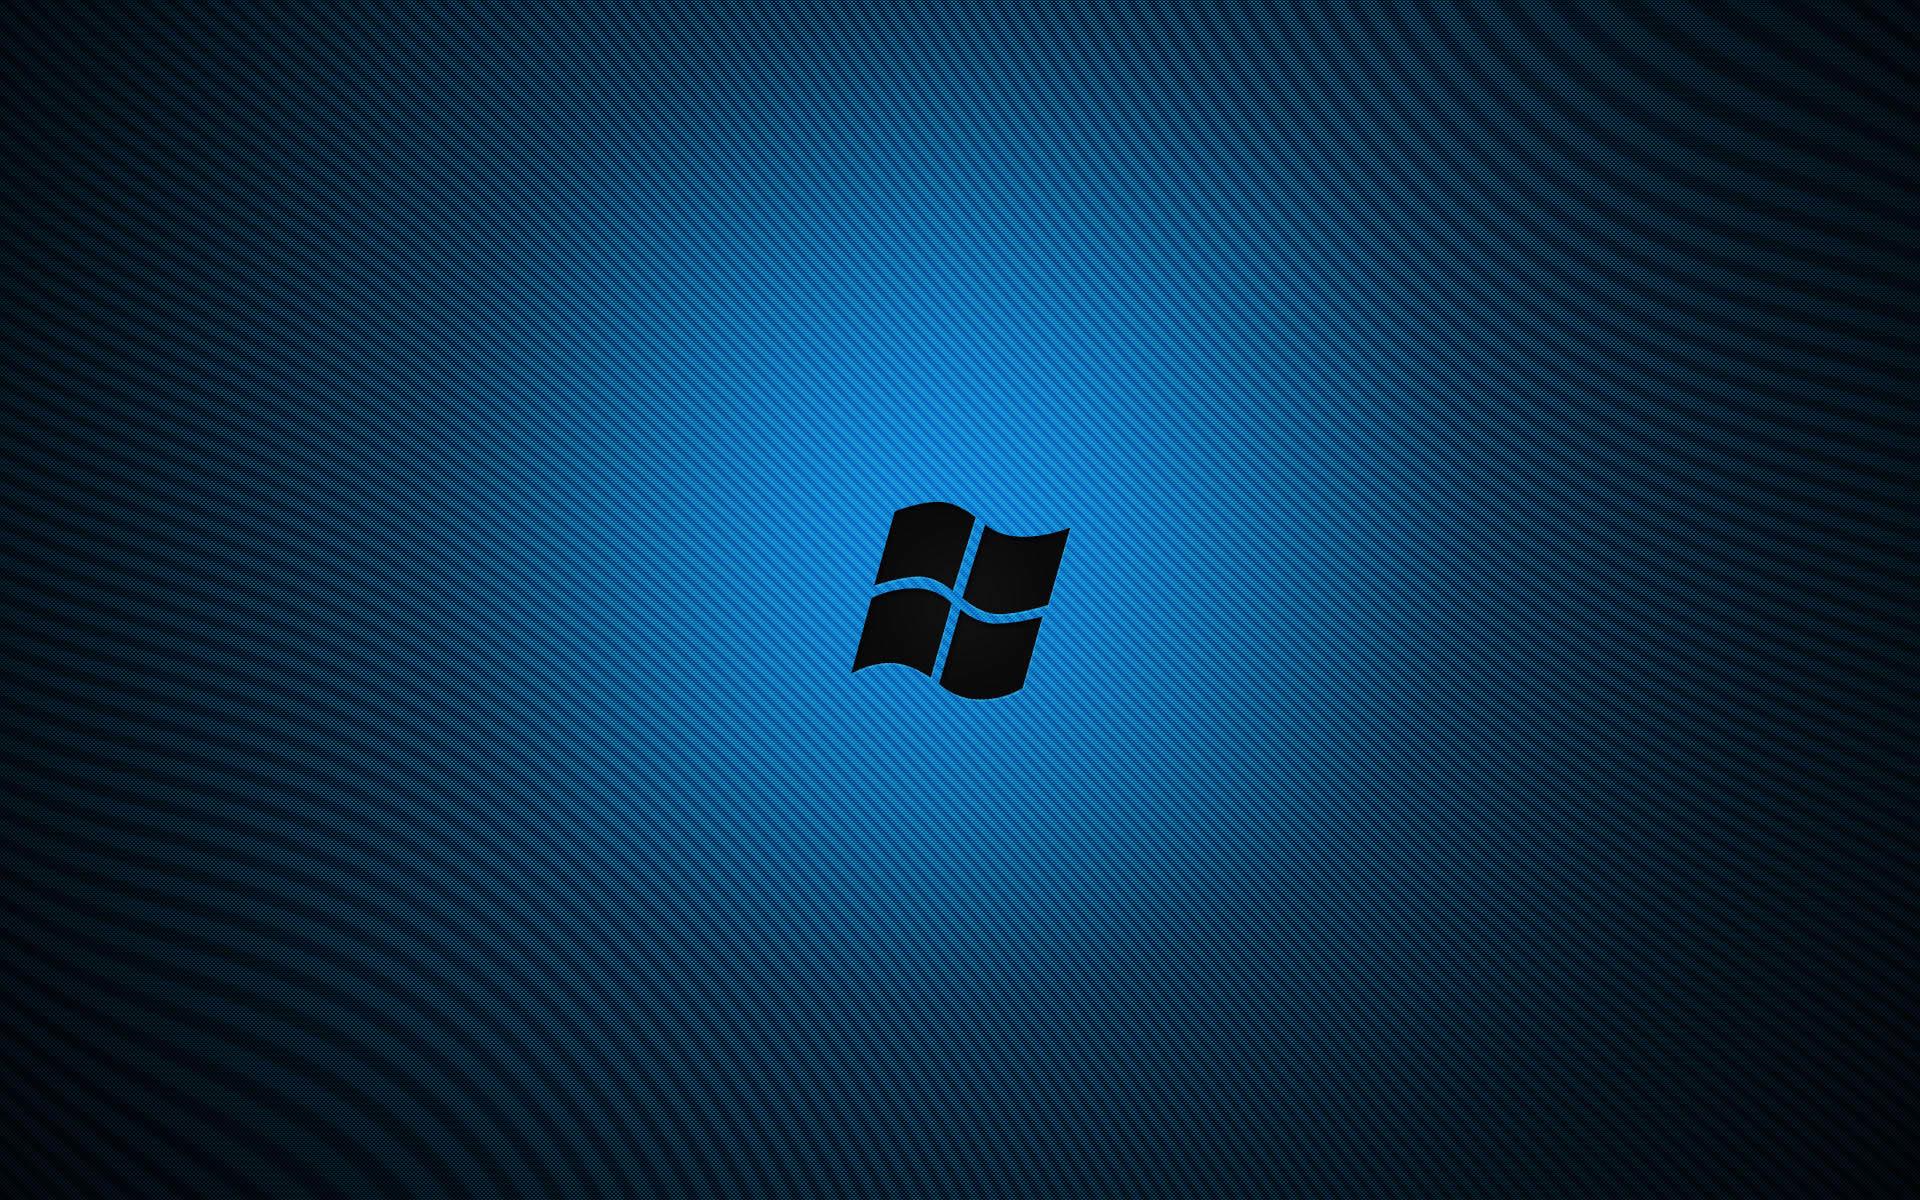 WXR High Quality Creative Windows Wallpaper .ru